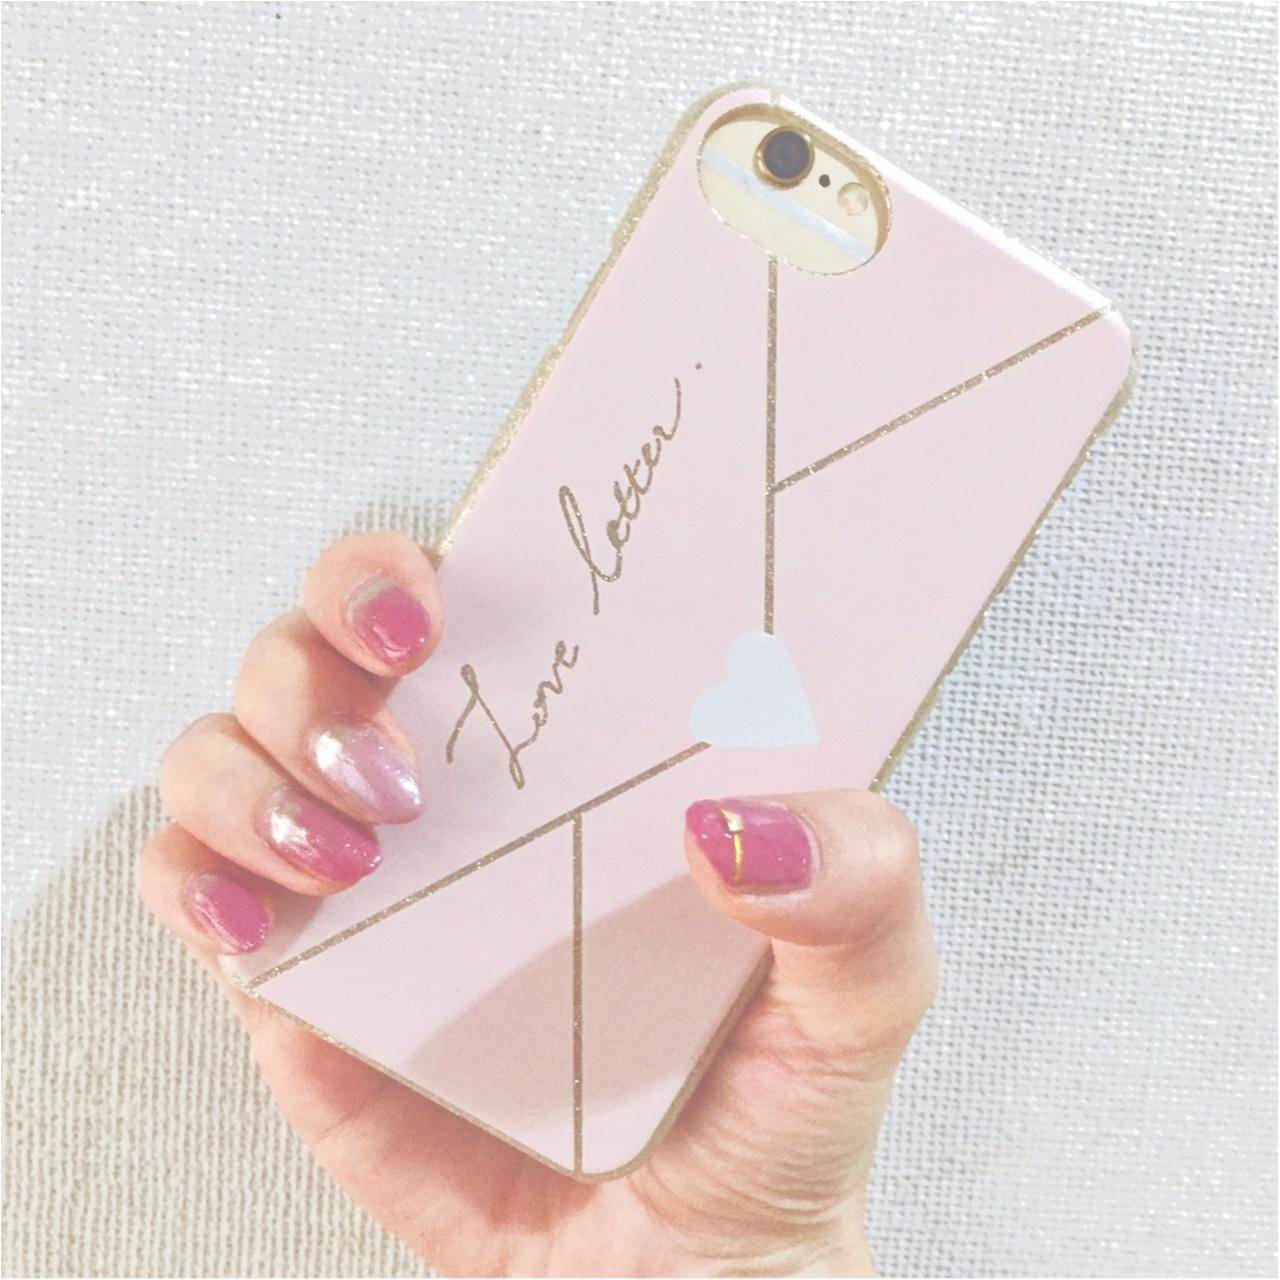 【iPhone case】可愛い♡可愛い♡love letterのケース見つけちゃいました❤︎❤︎❤︎_2